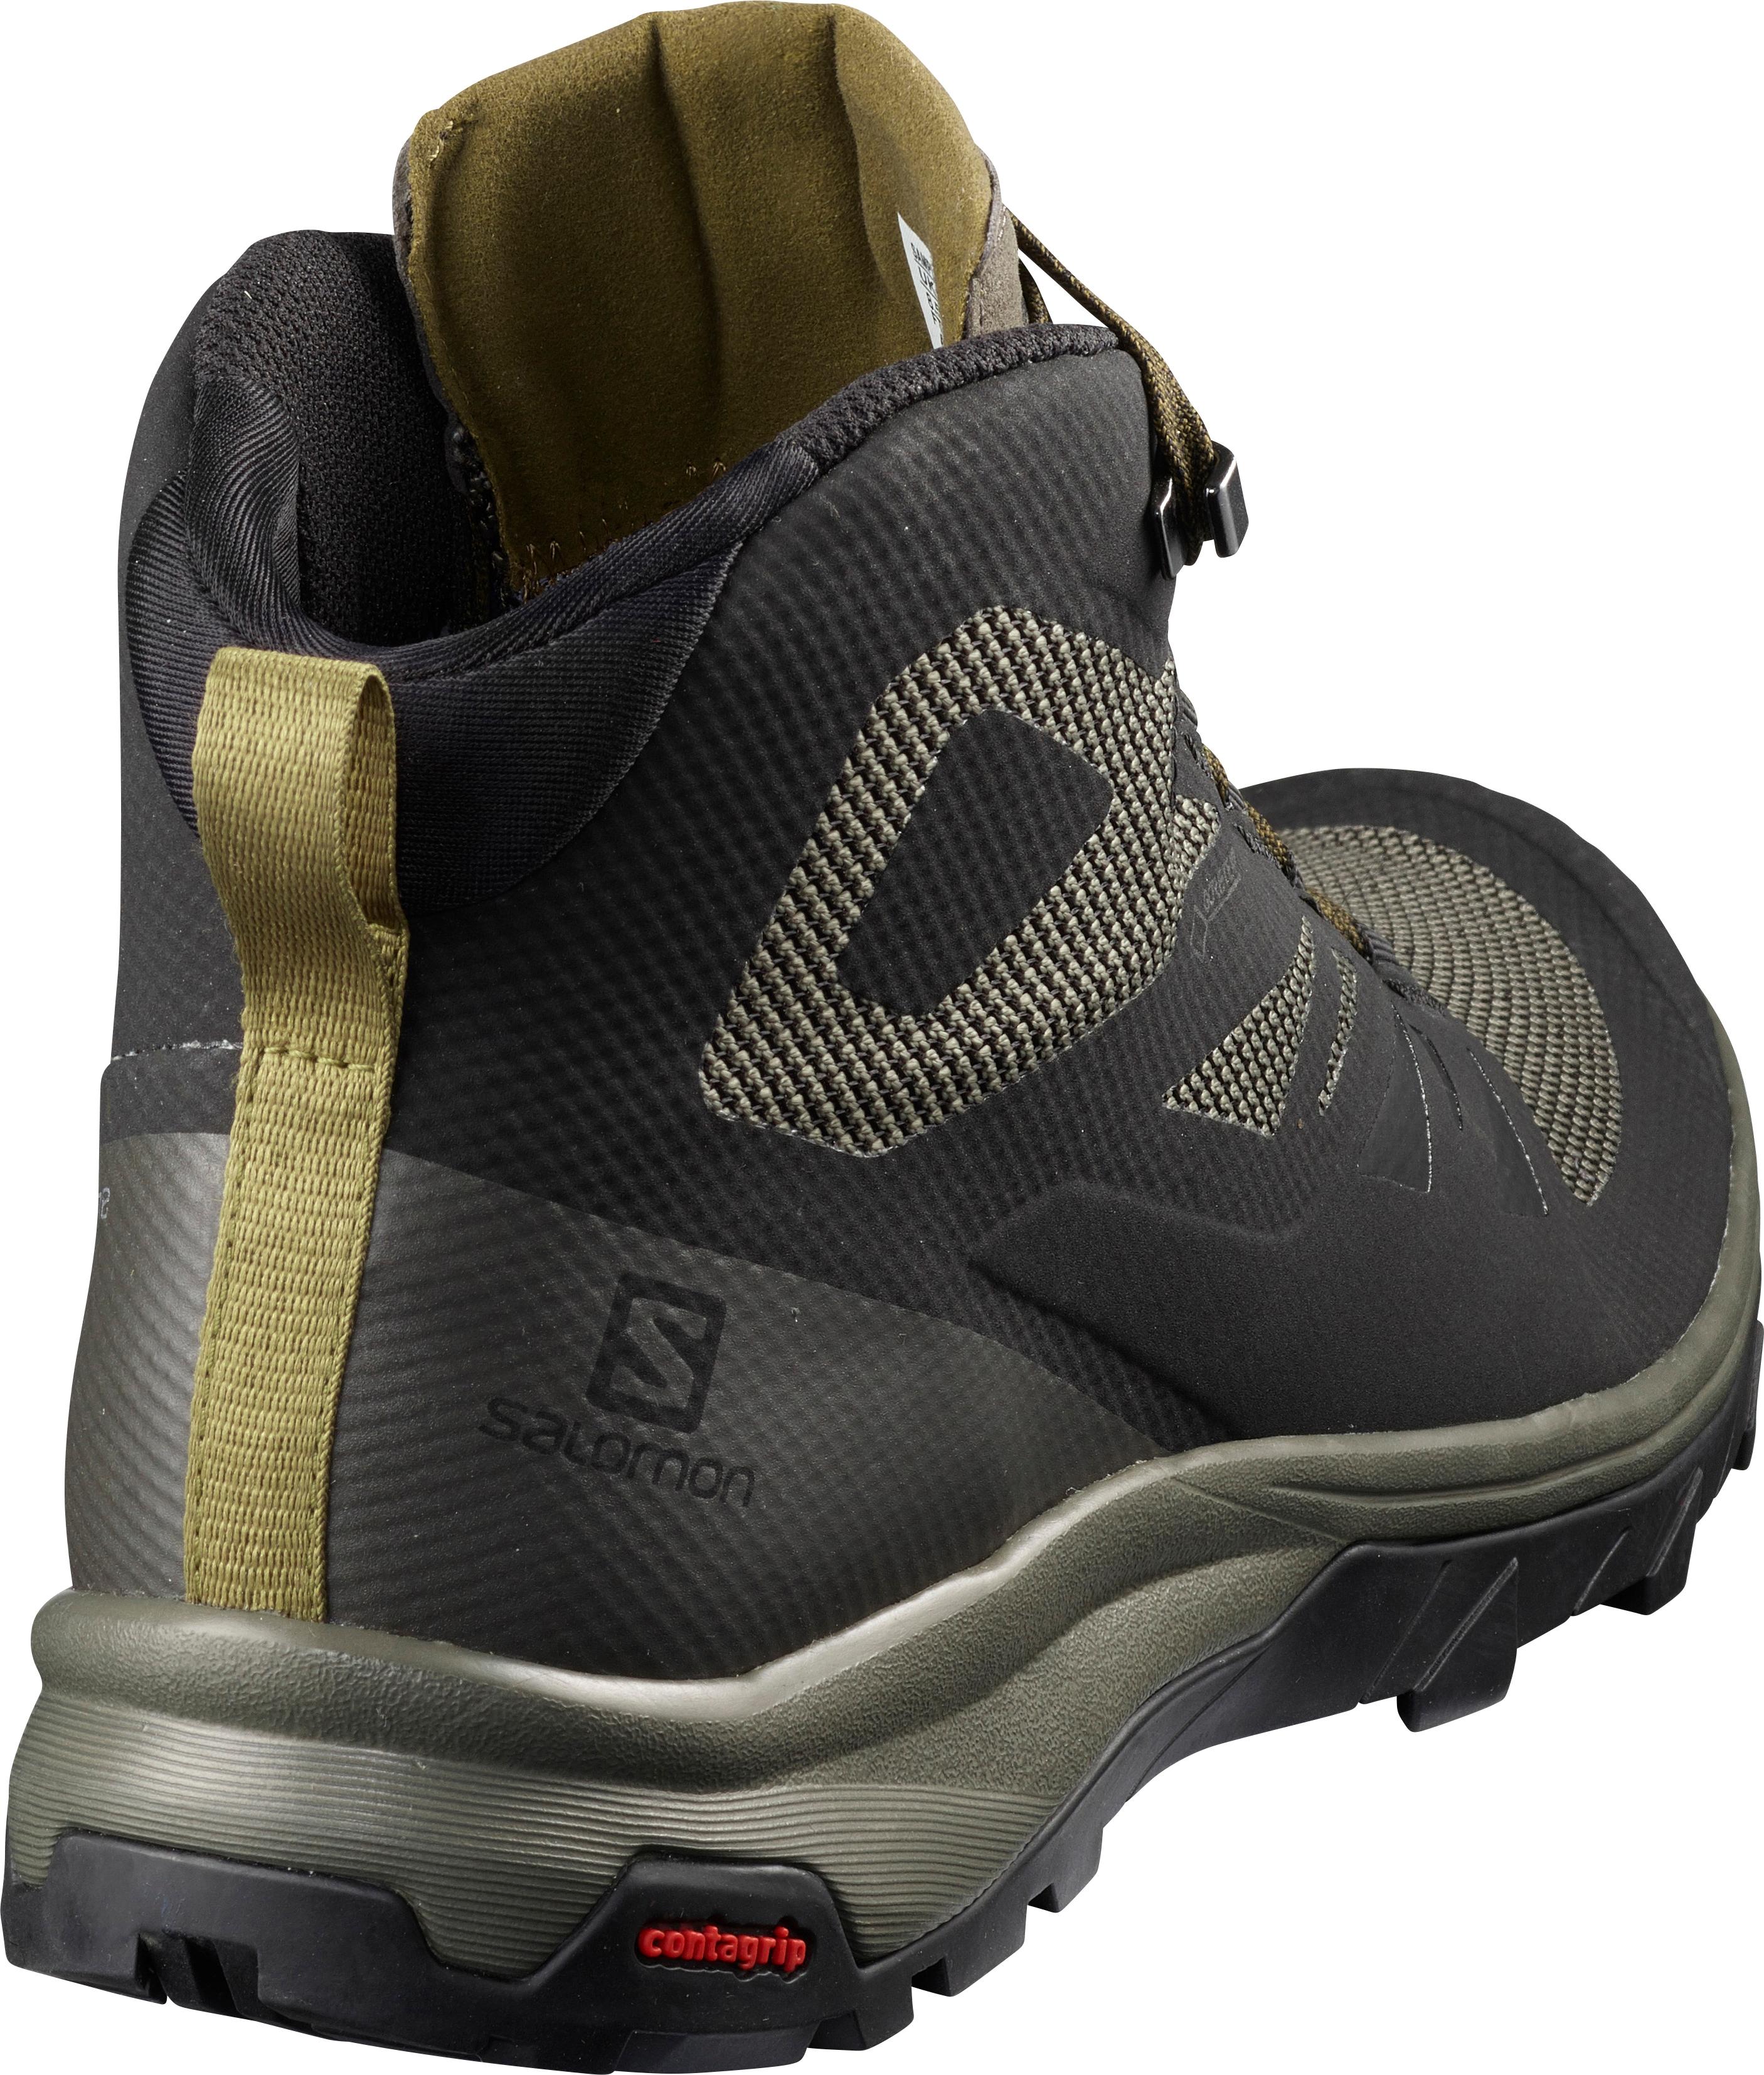 Salomon OUTLINE MID GTX Shoe 2020 blackbelugacapers